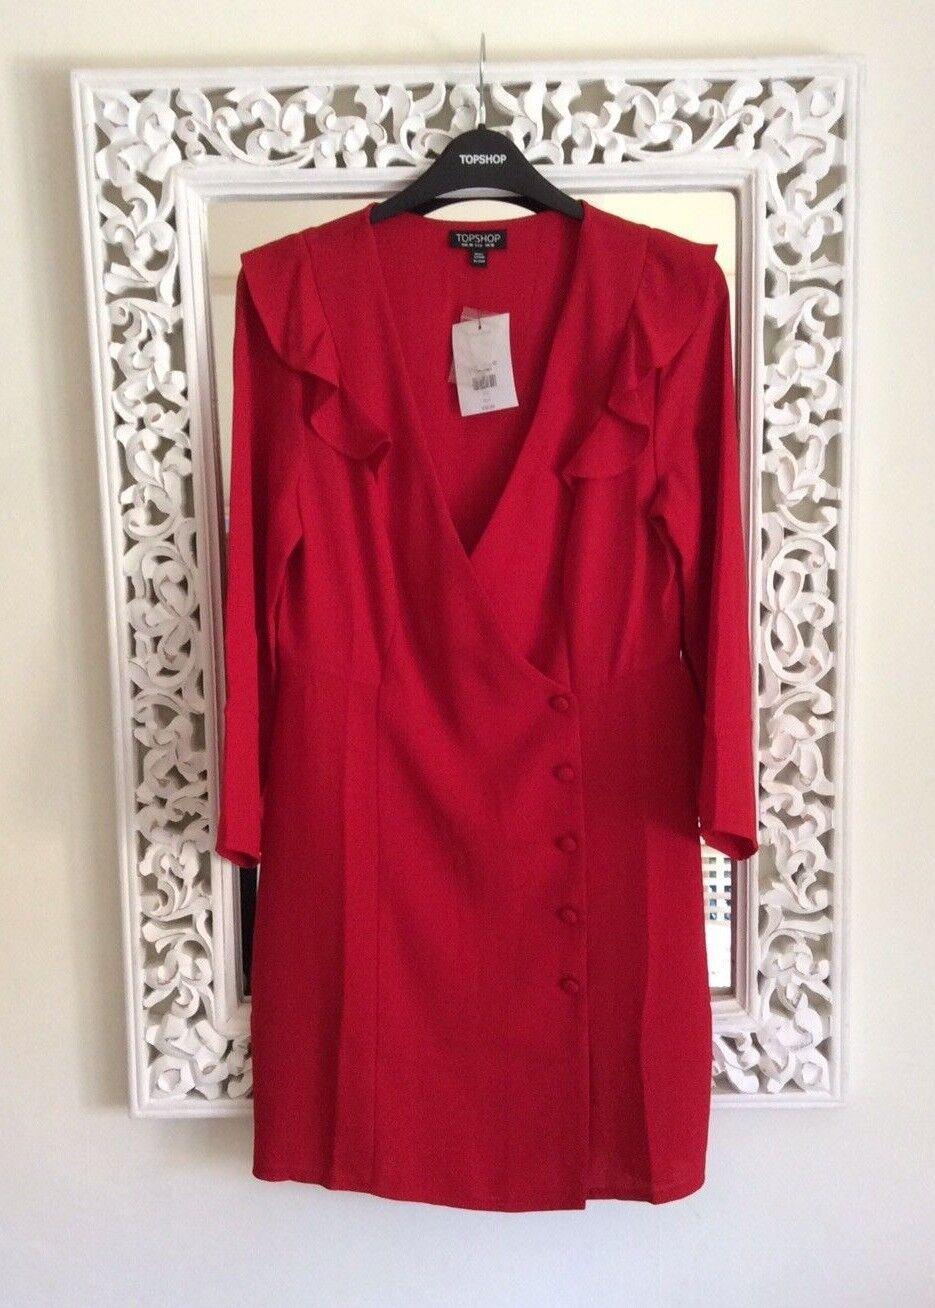 Topshop Red Mini Ruffle Wrap Dress, UK Size 8 New